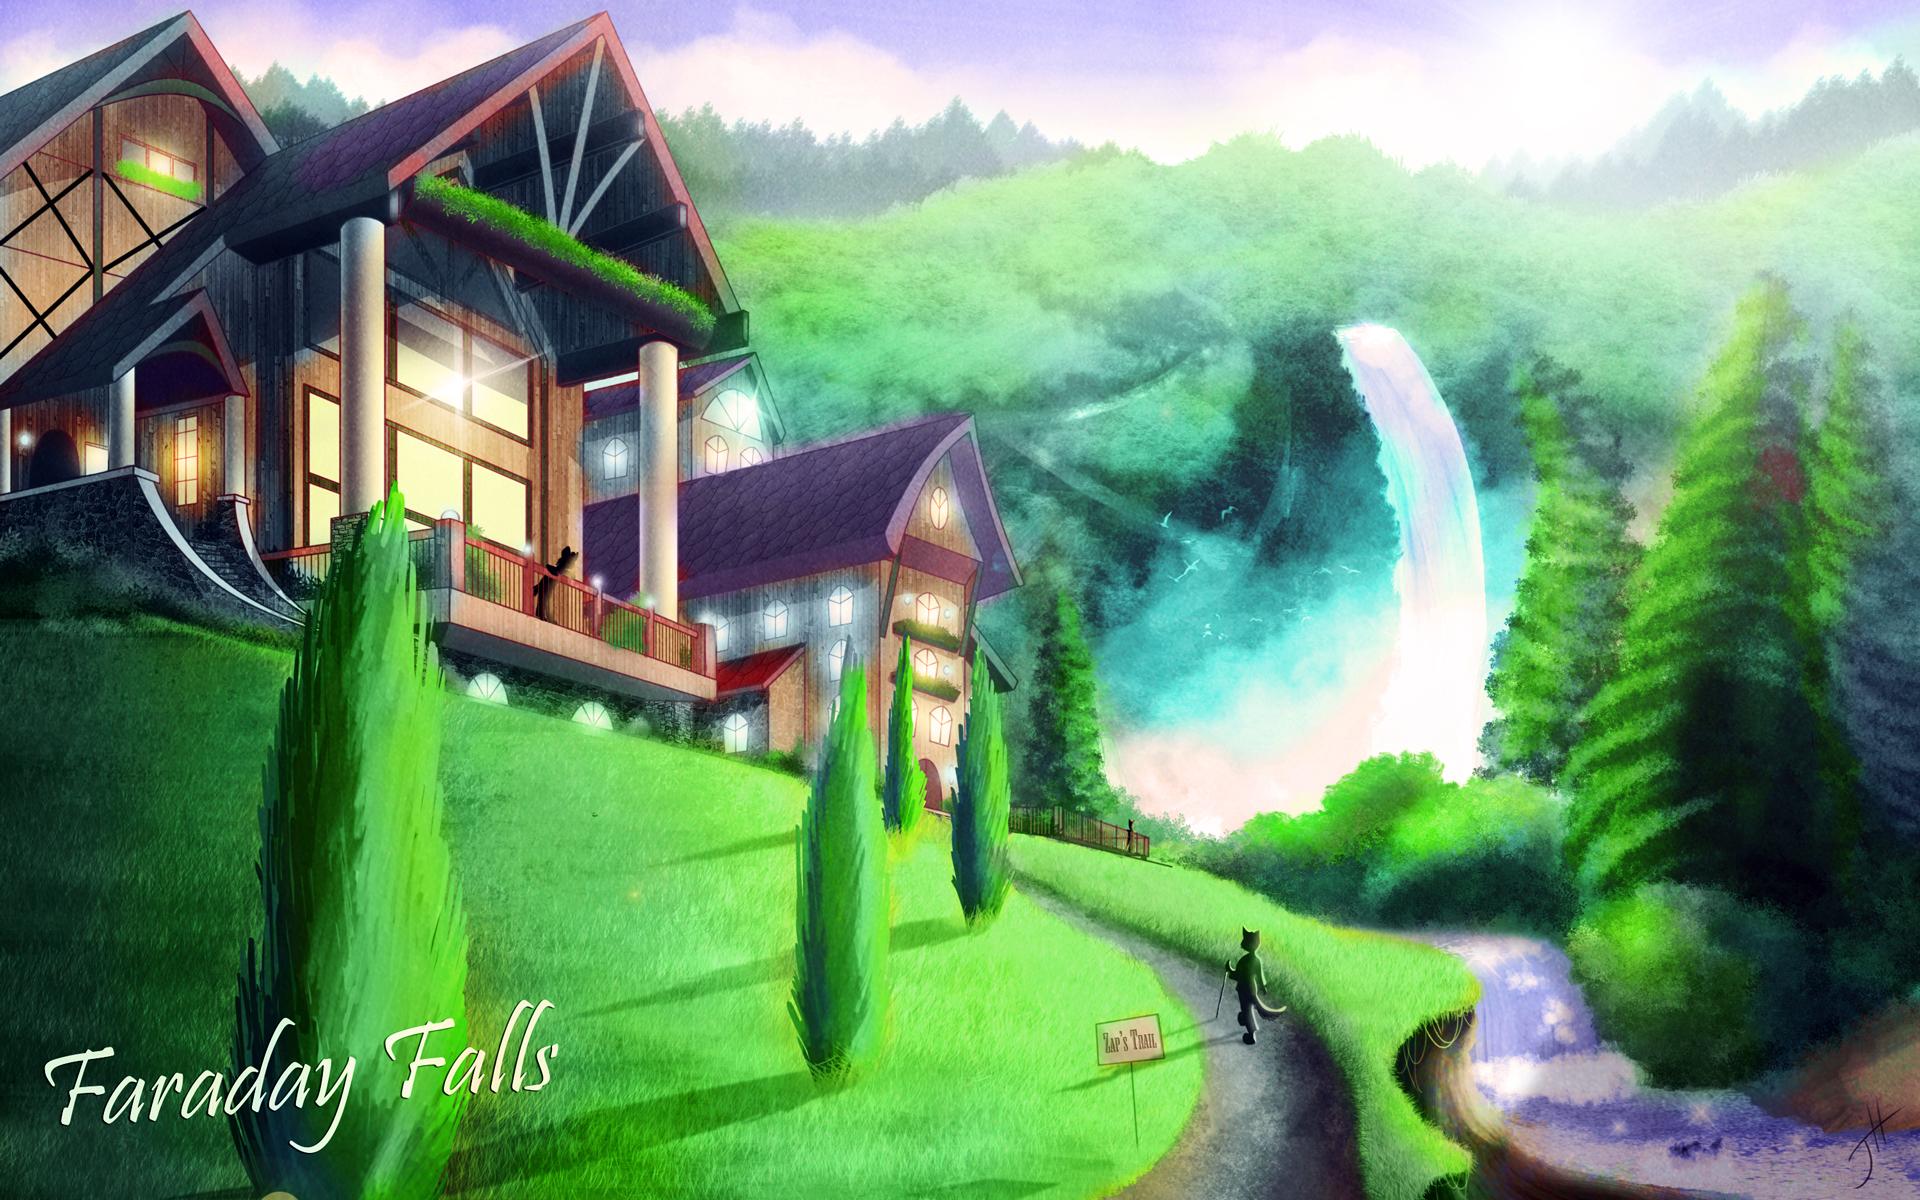 Faraday Falls Resort